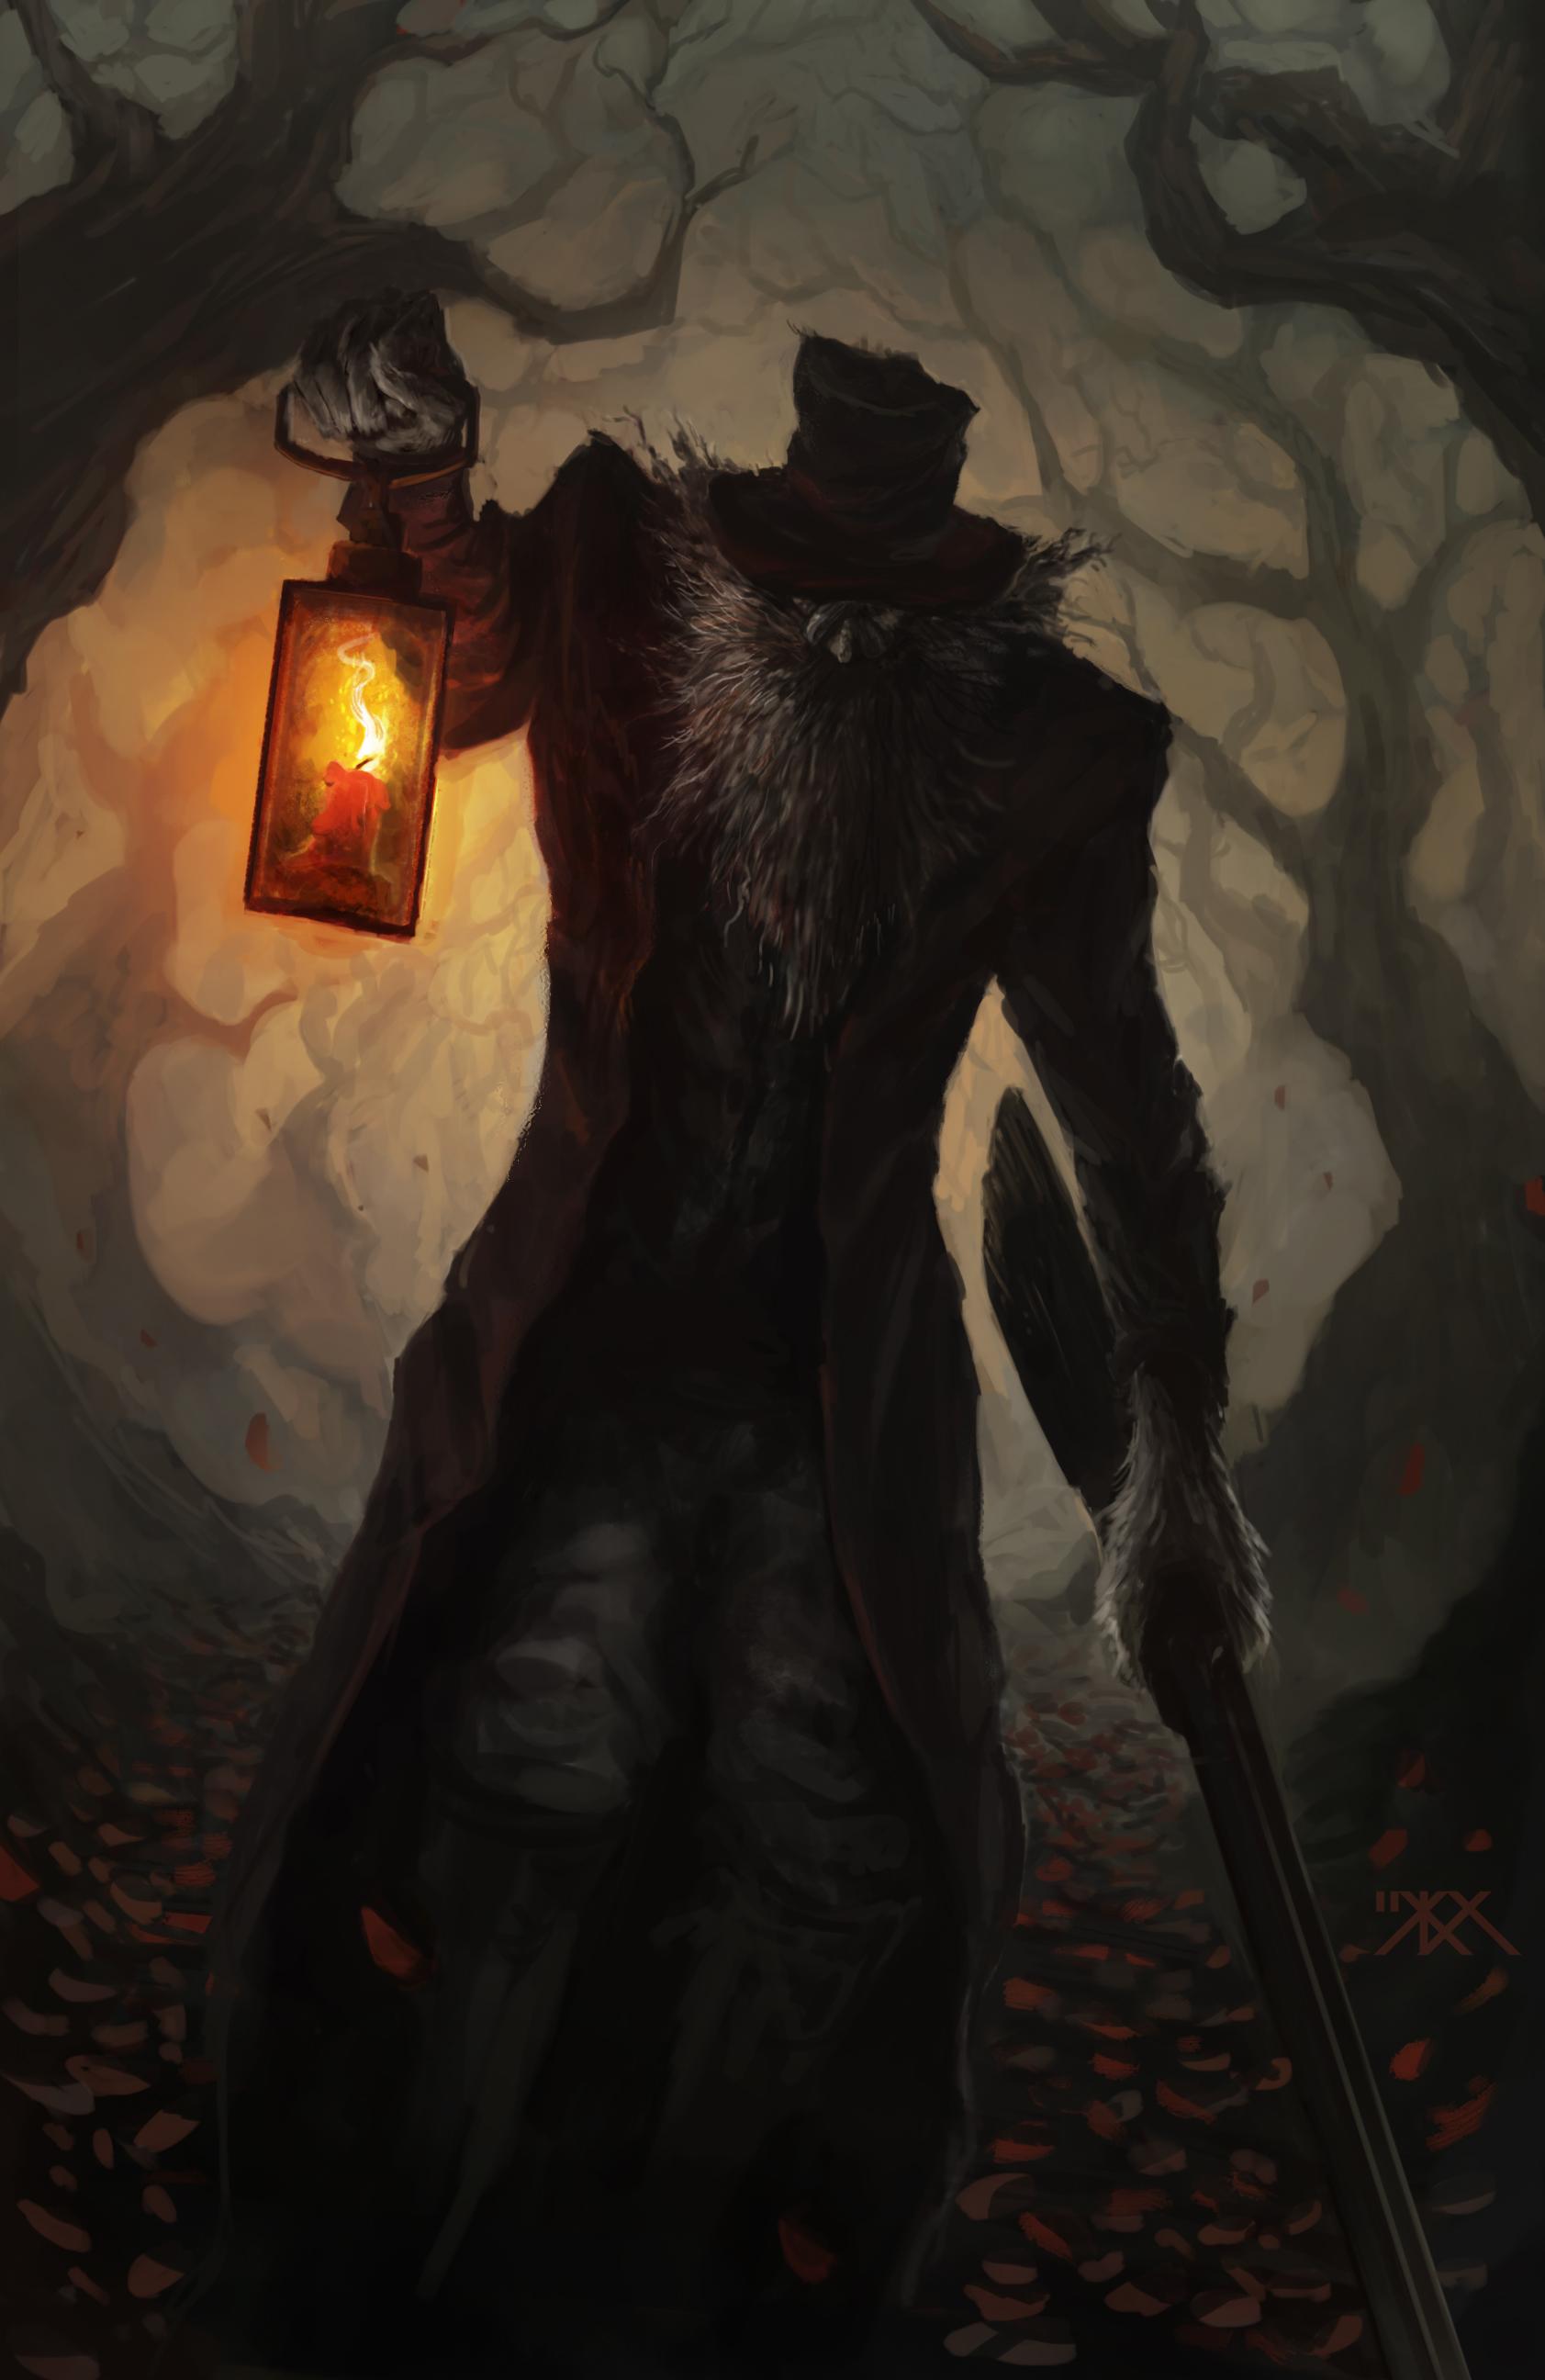 The Huntsman by Inkyh on DeviantArt